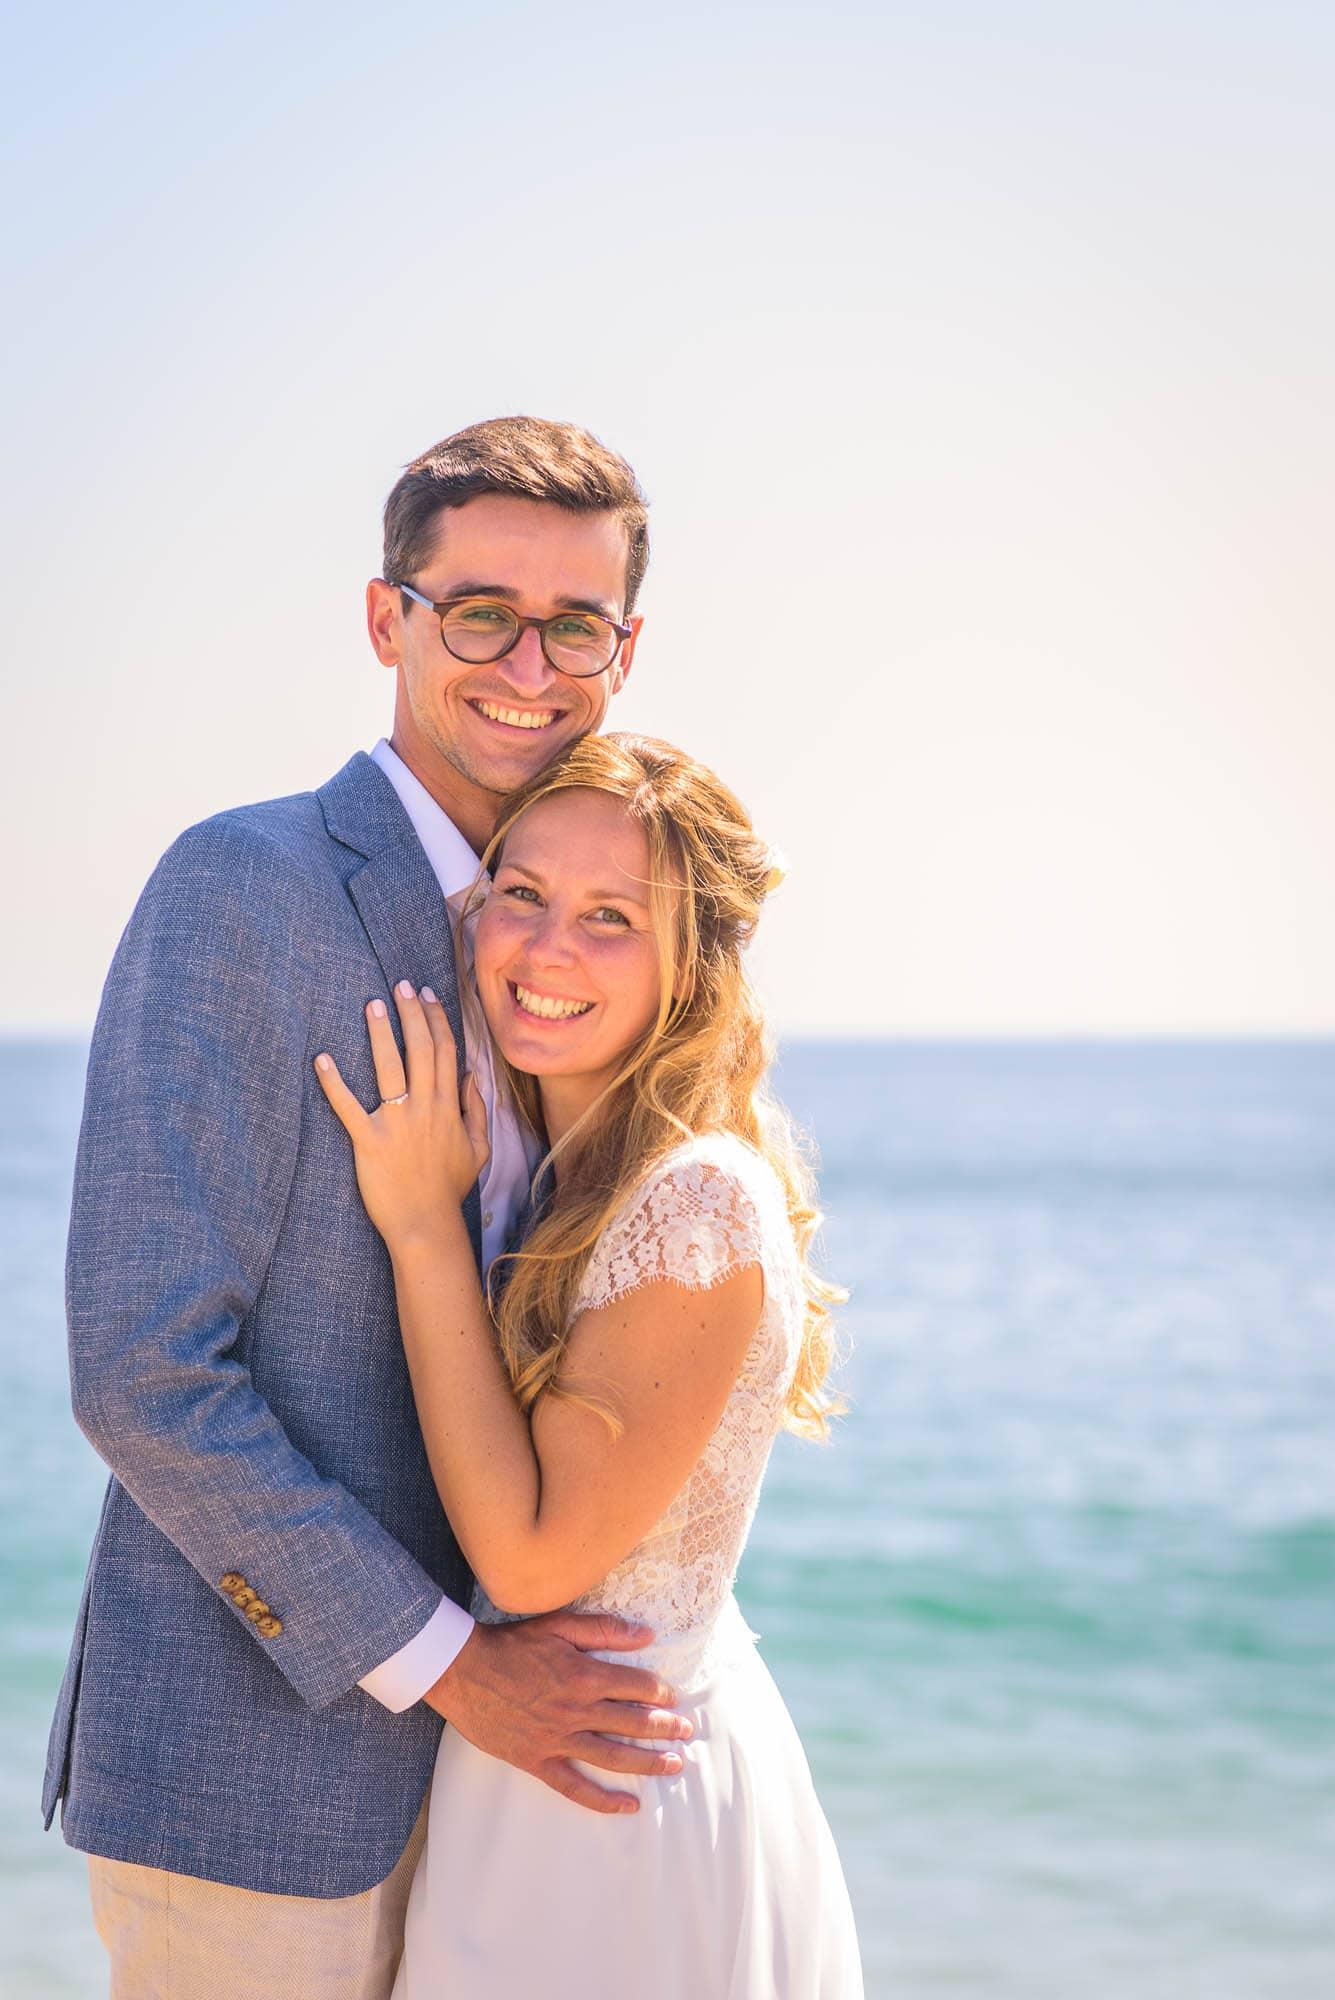 038_Alan_and_Heidi_Wedding_Verena_Andreas